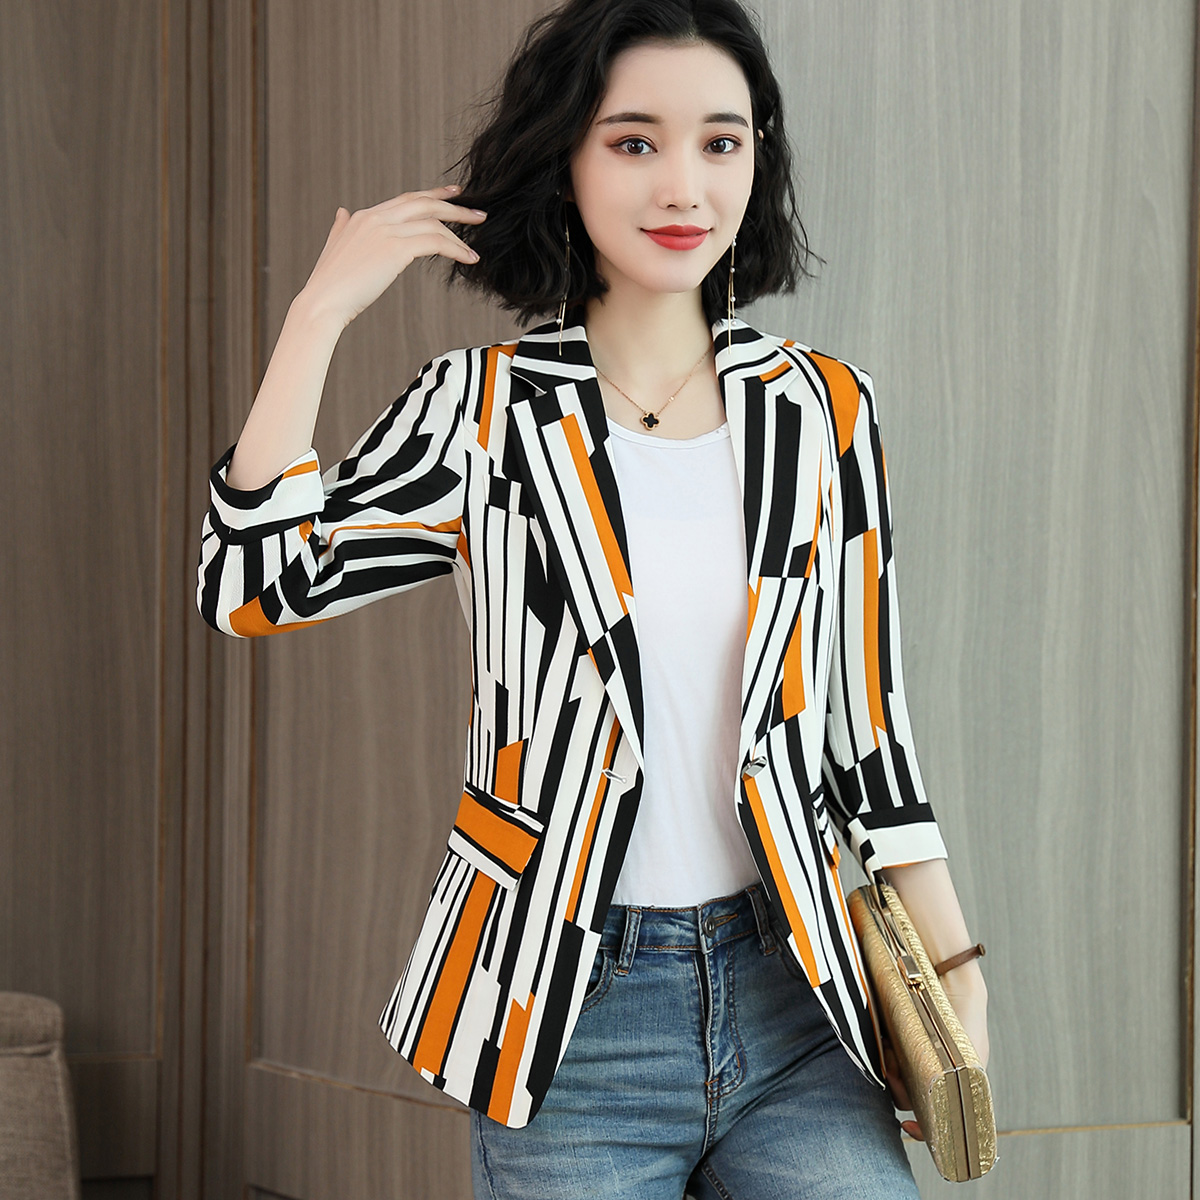 Korean Design Fashion Abstarct Print Women Casual Long Sleeve Open Front Cardigan Office Work Zip Blazer Suit